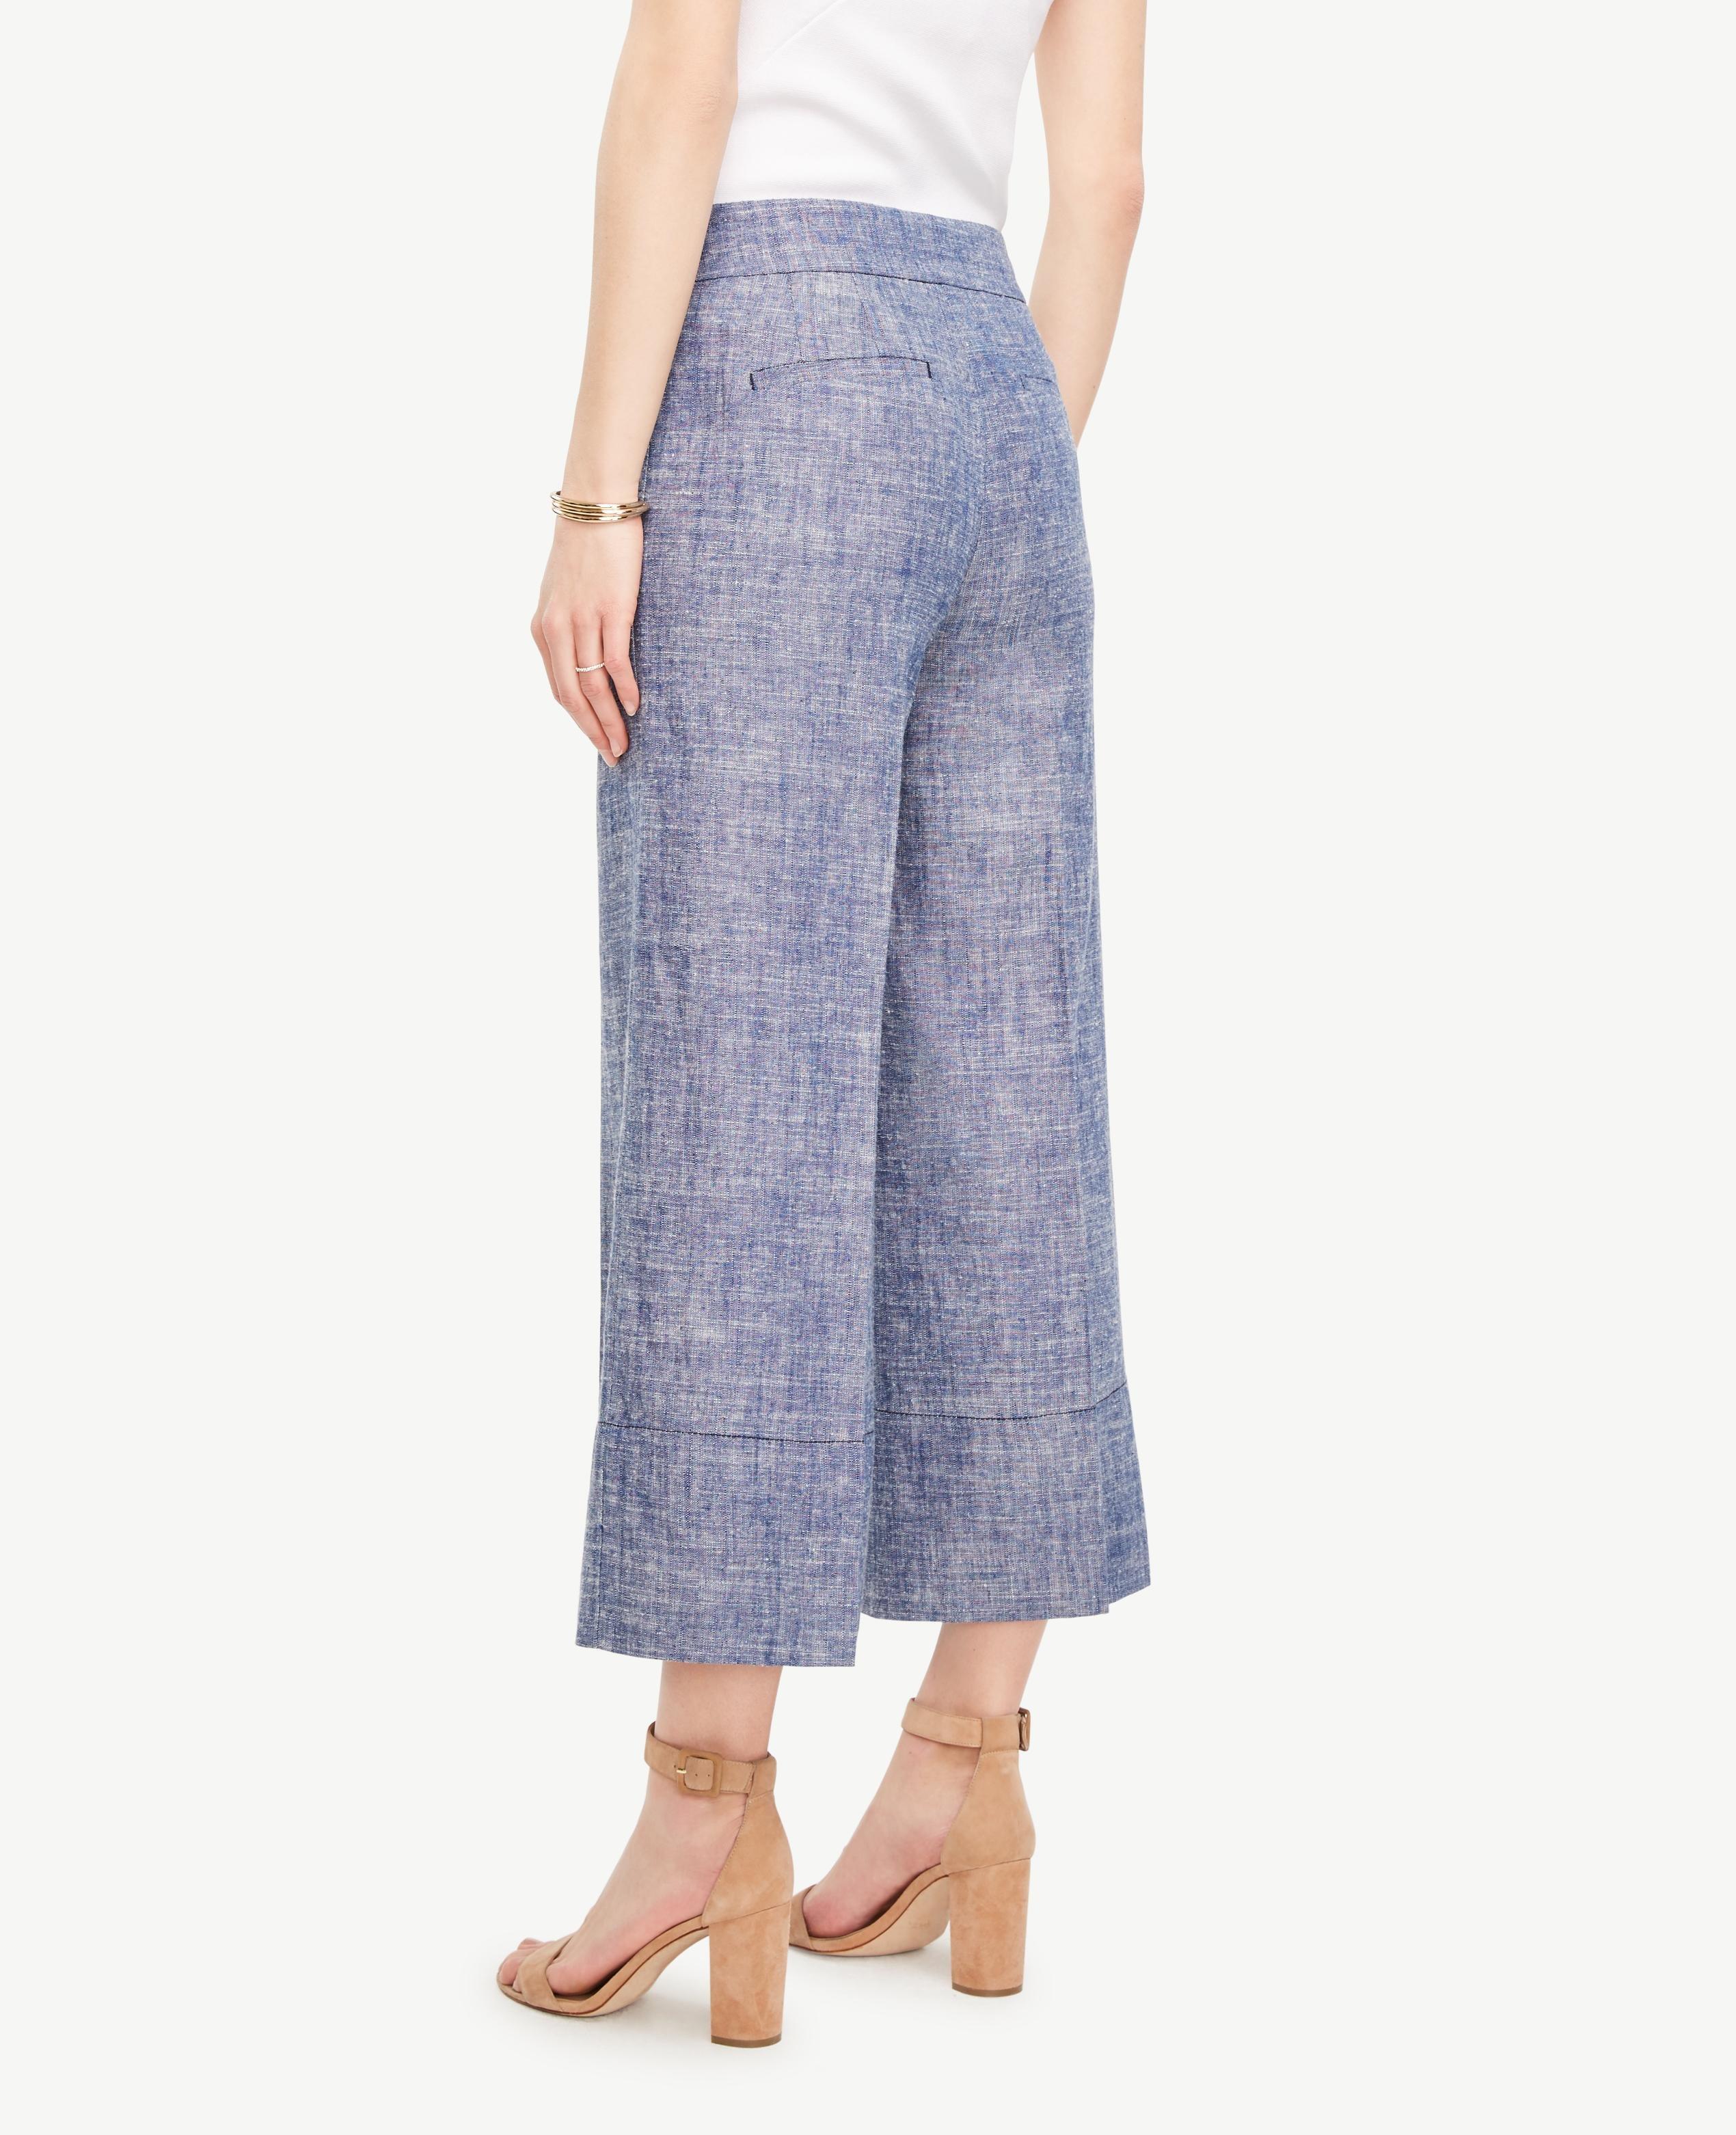 Ann taylor the petite wide leg marina pant in blue lyst for Ann taylor loft fashion island